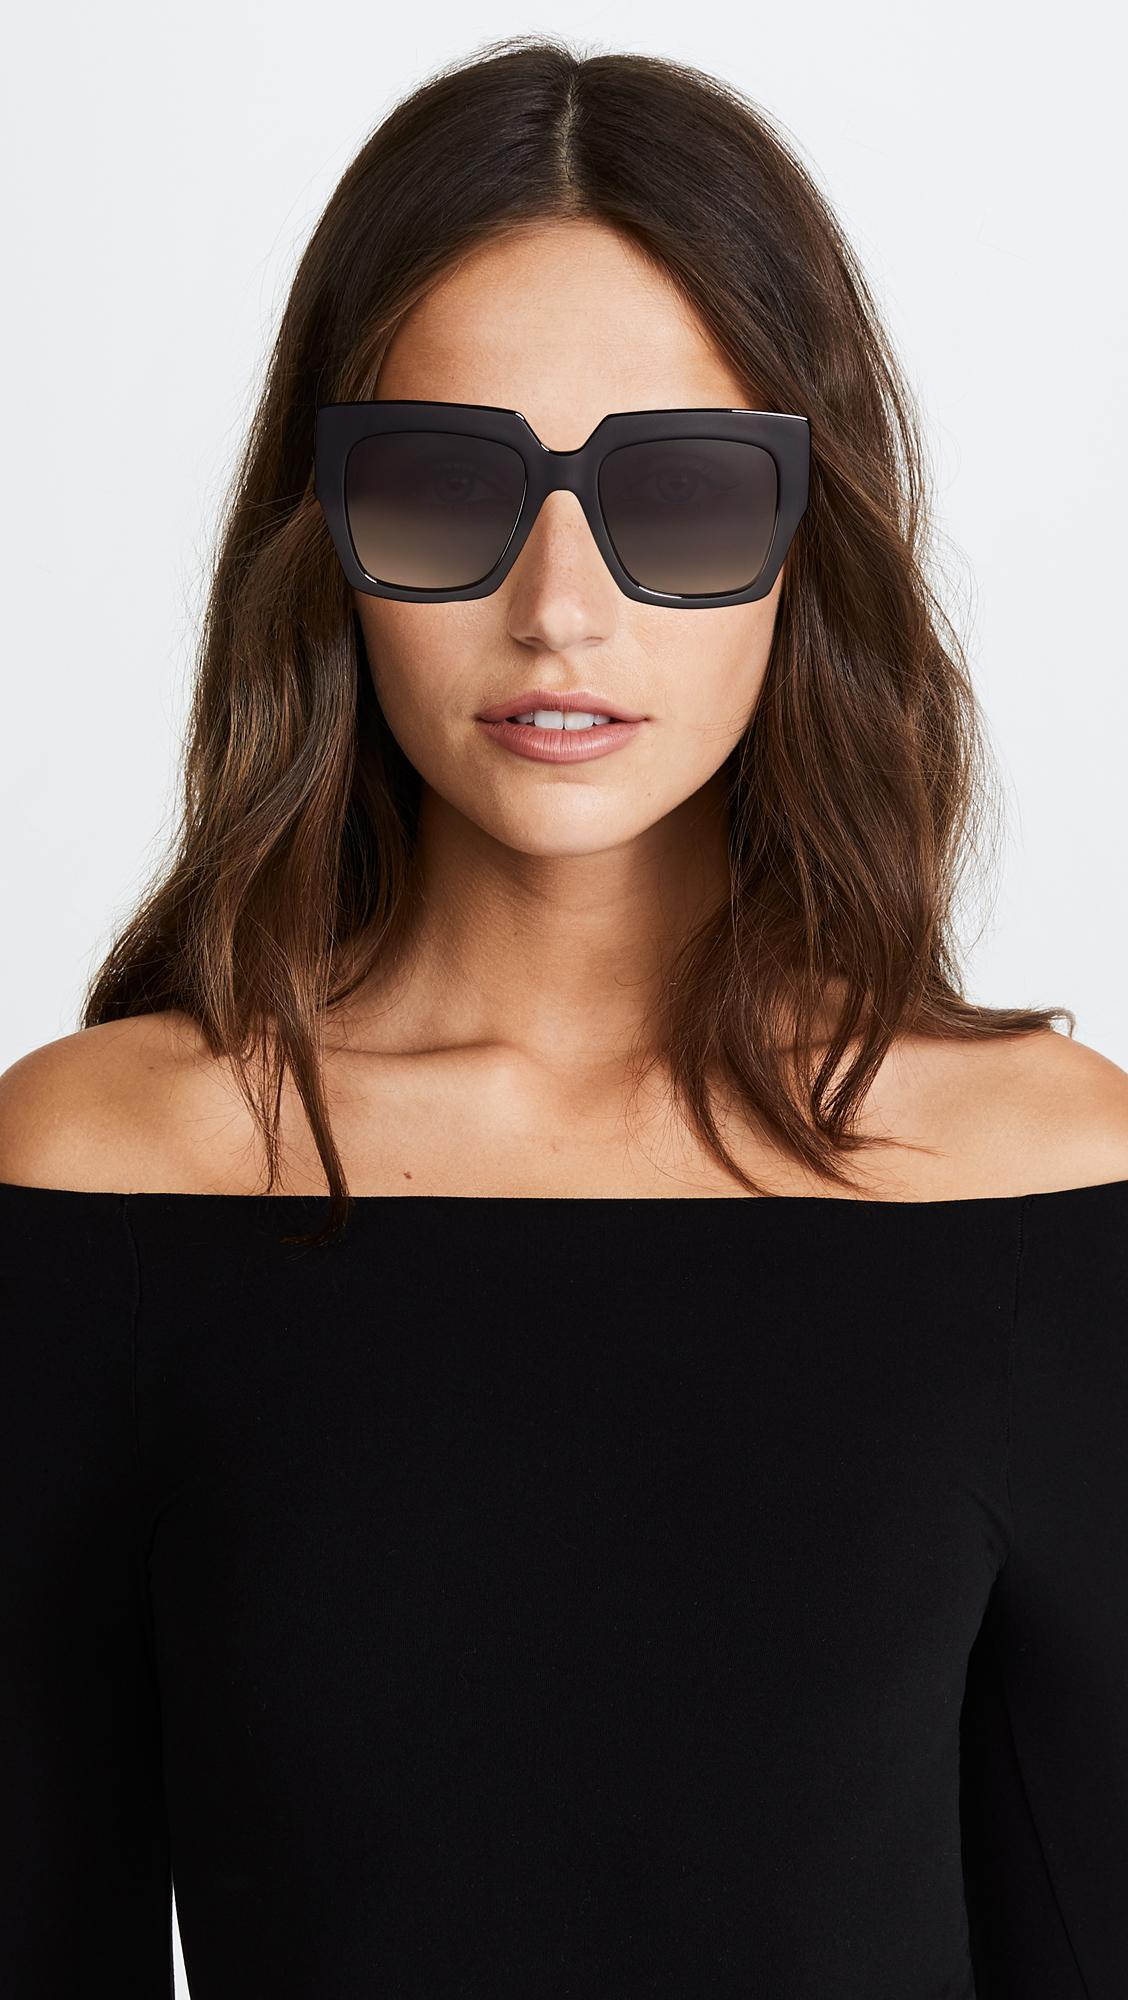 b9466c6957 Fendi Square Colorblock Sunglasses - Lyst